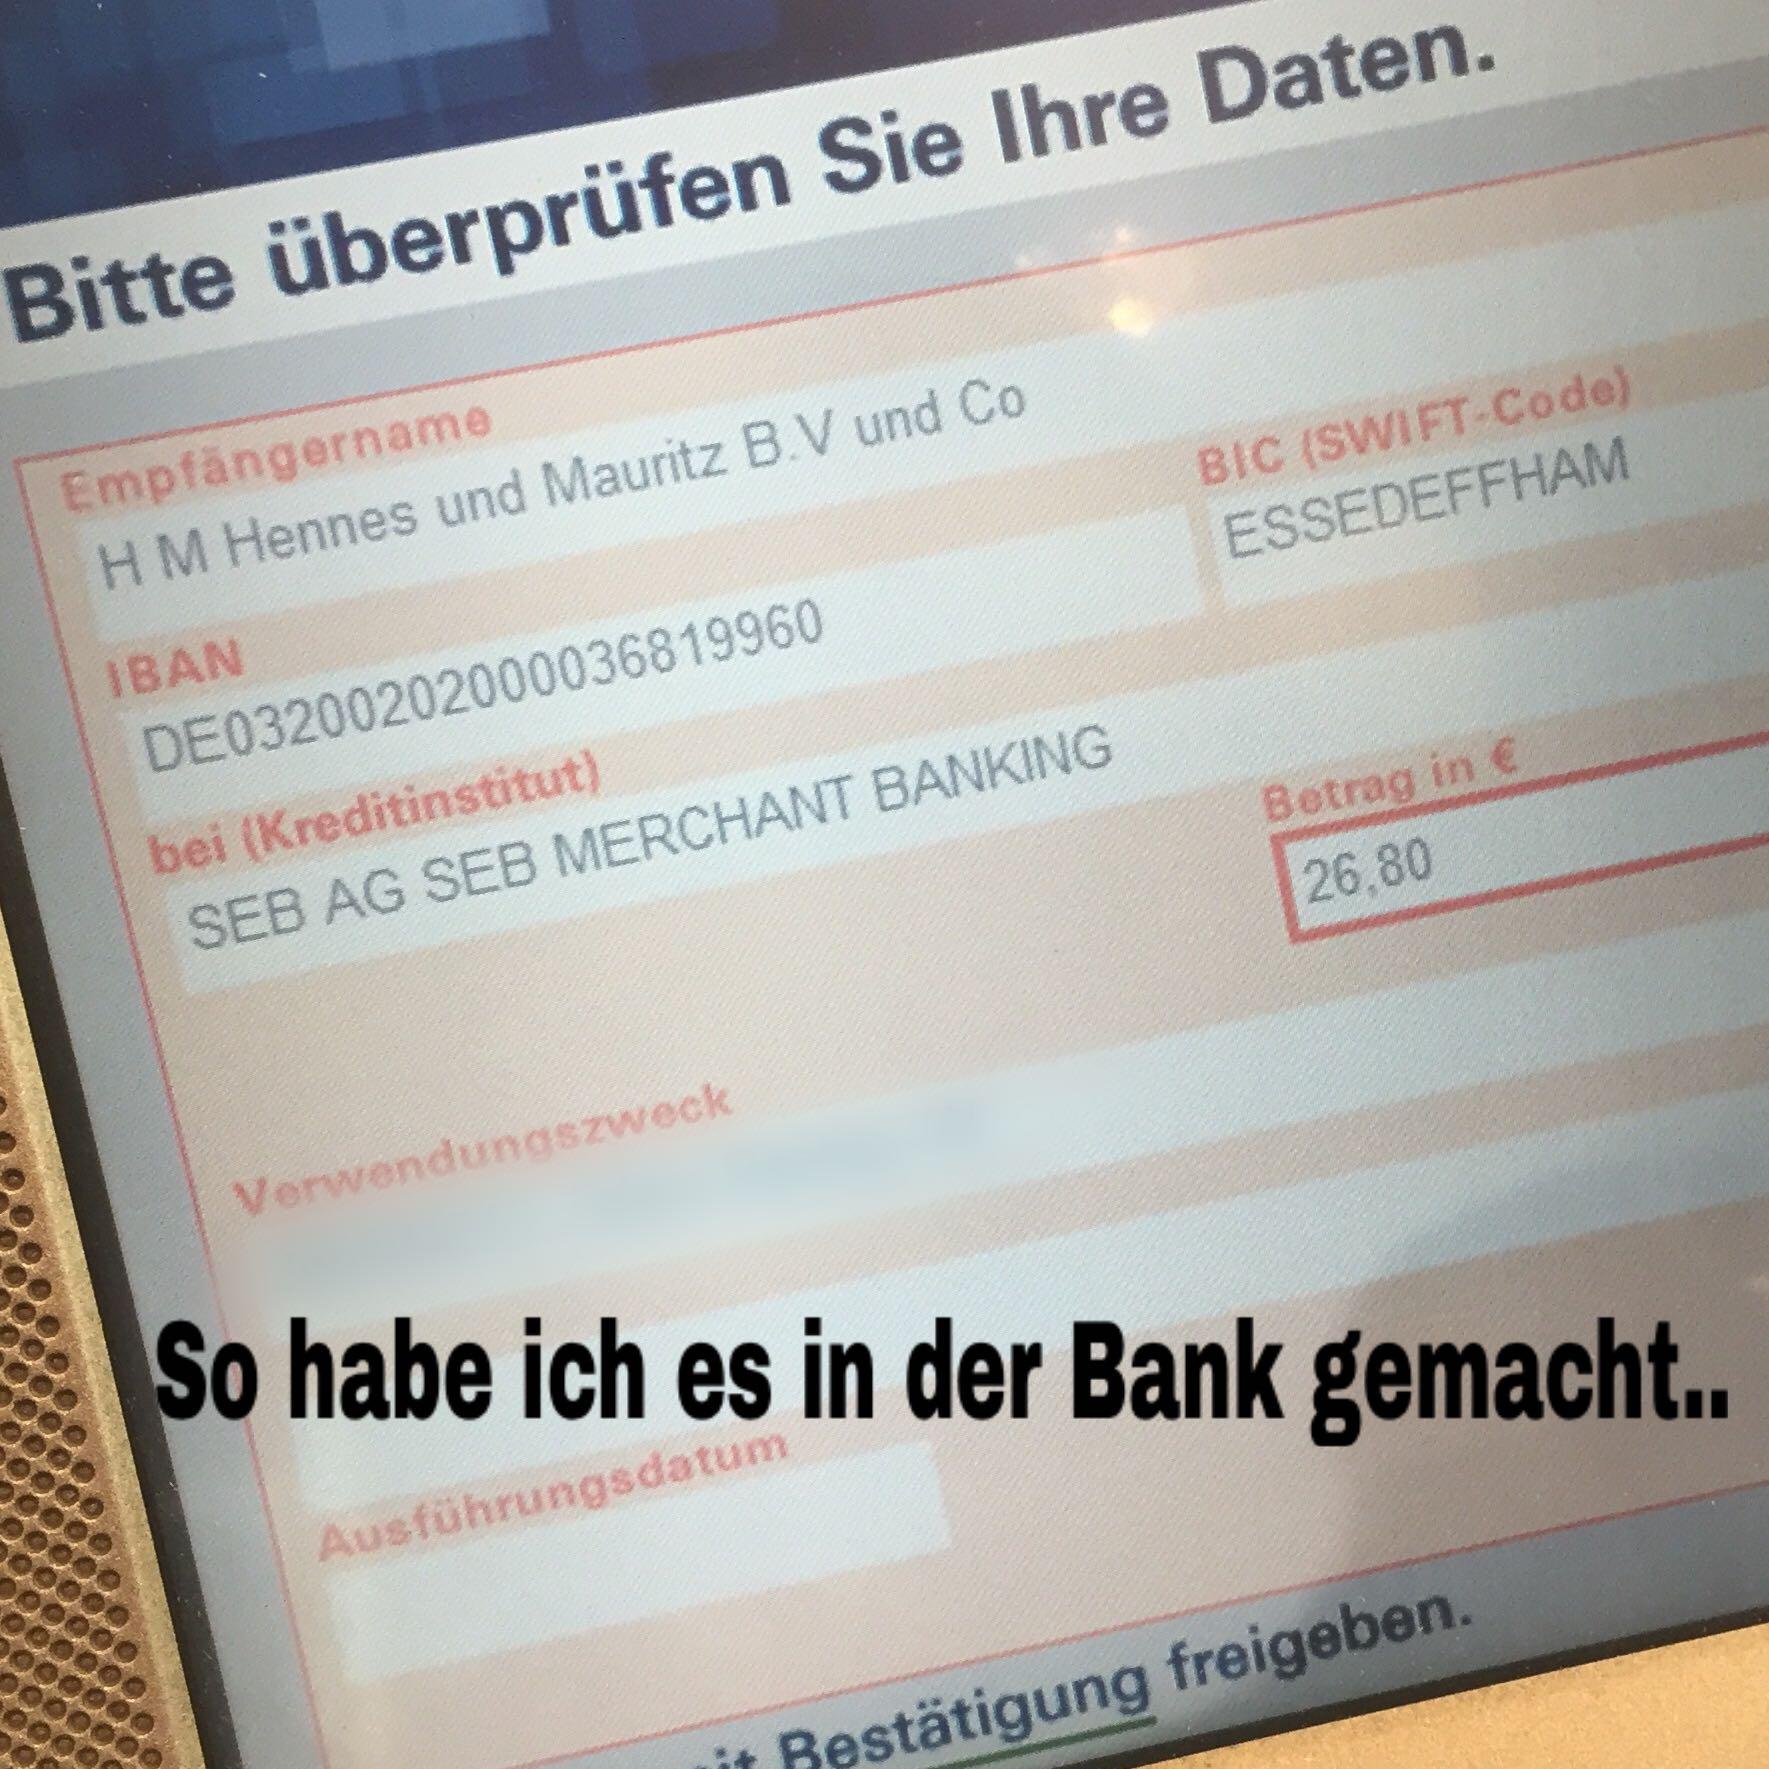 H M Rechnung : h m rechnung berweisung falsch oder richtig hundm hennes und mauritz ~ Themetempest.com Abrechnung